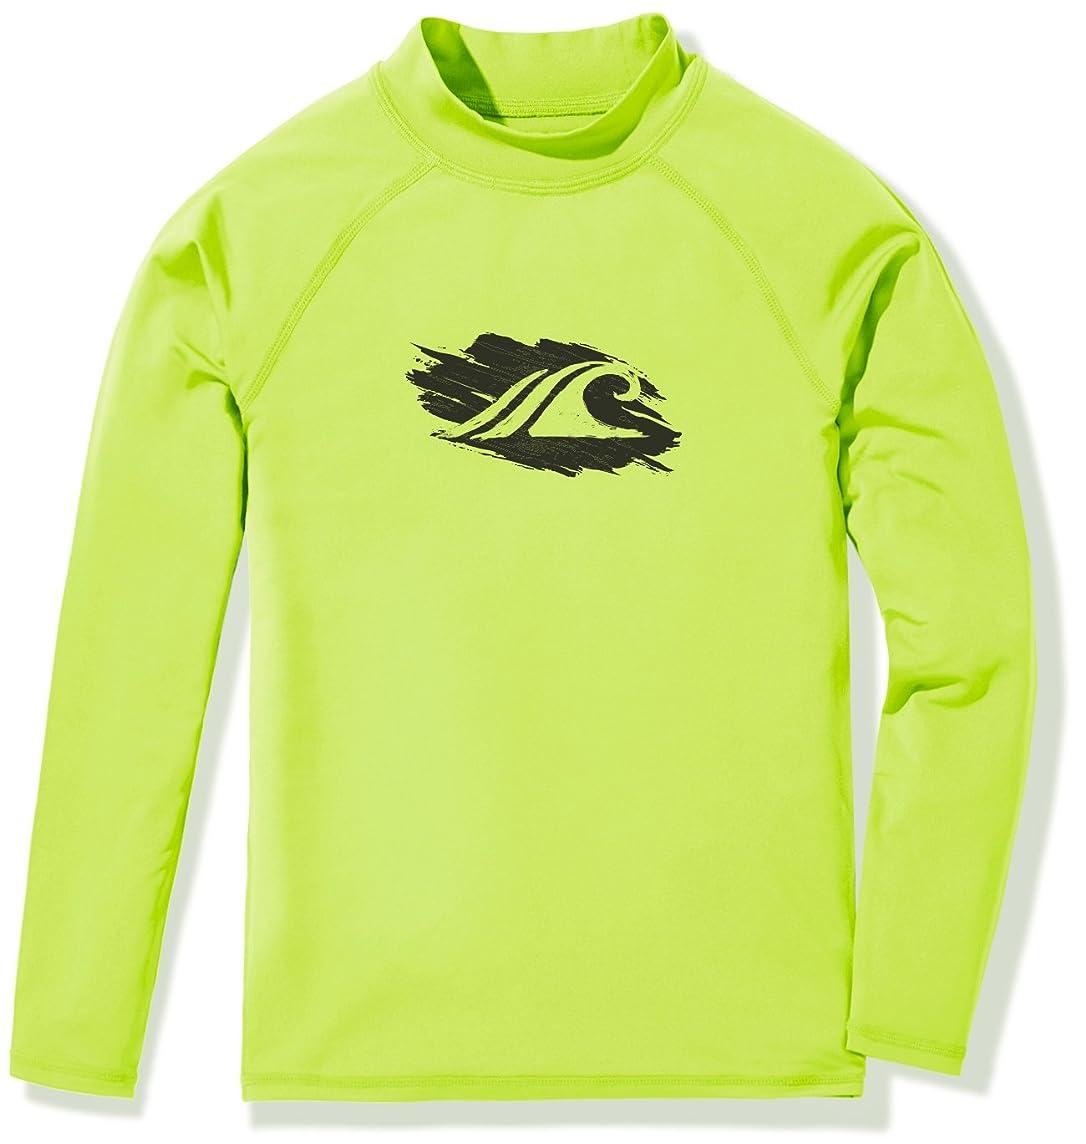 TSLA Girls UPF 50+ Long Sleeve Rashguard Youth Surf Kids Swim top